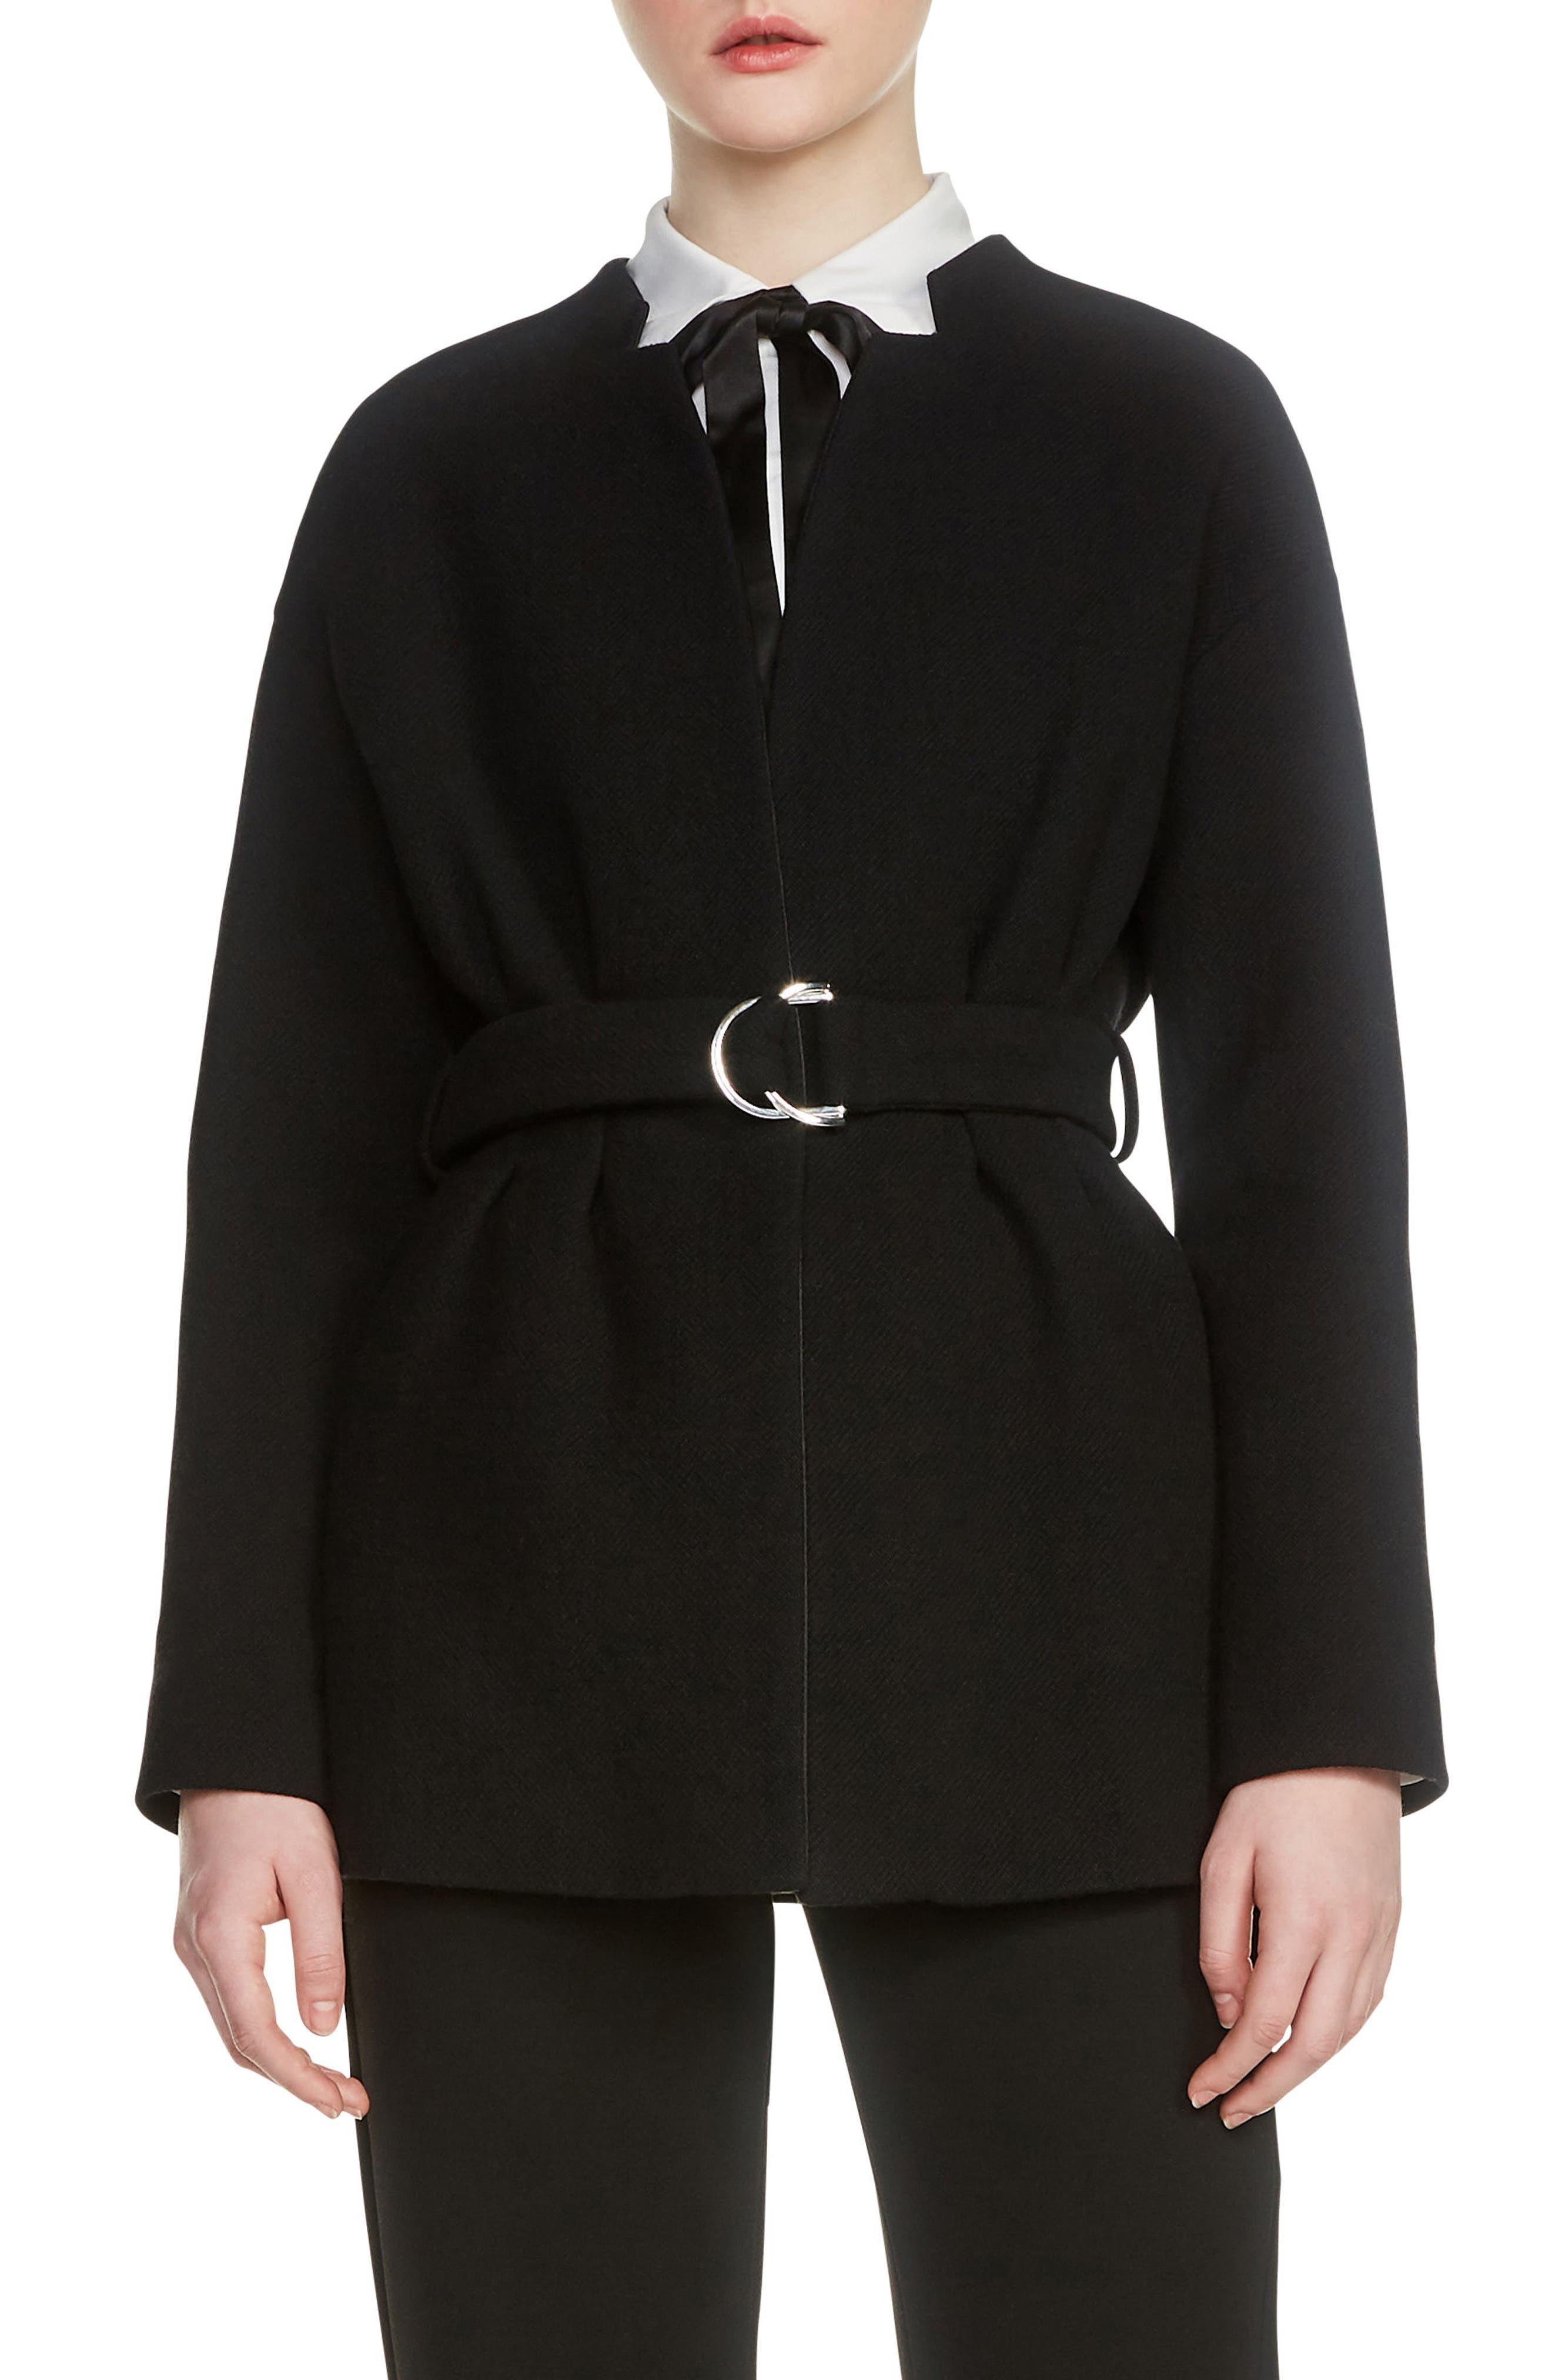 Gato Belted Jacket,                         Main,                         color, 001